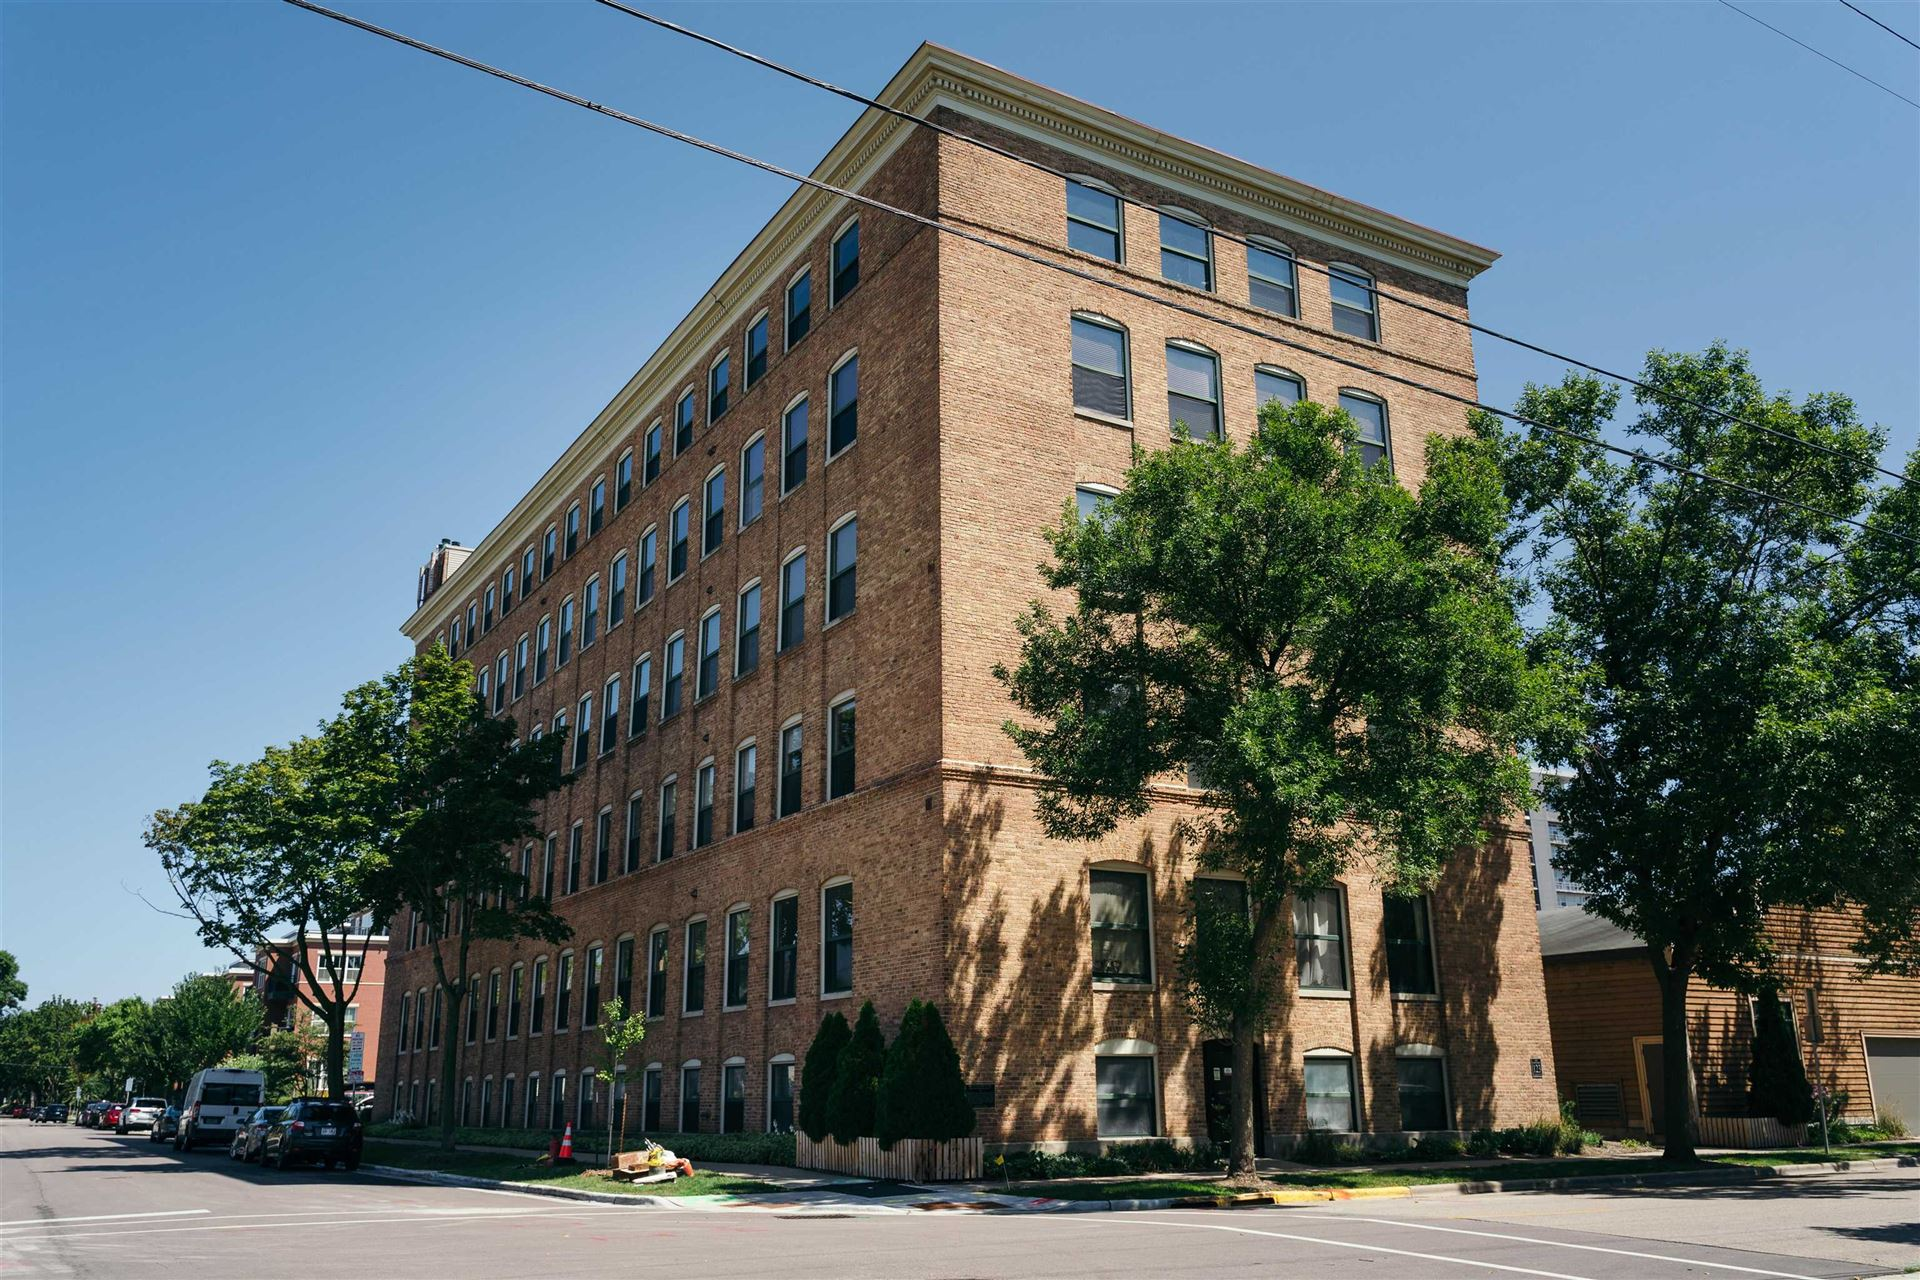 123 N Blount St #107, Madison, WI 53703 - #: 1918292